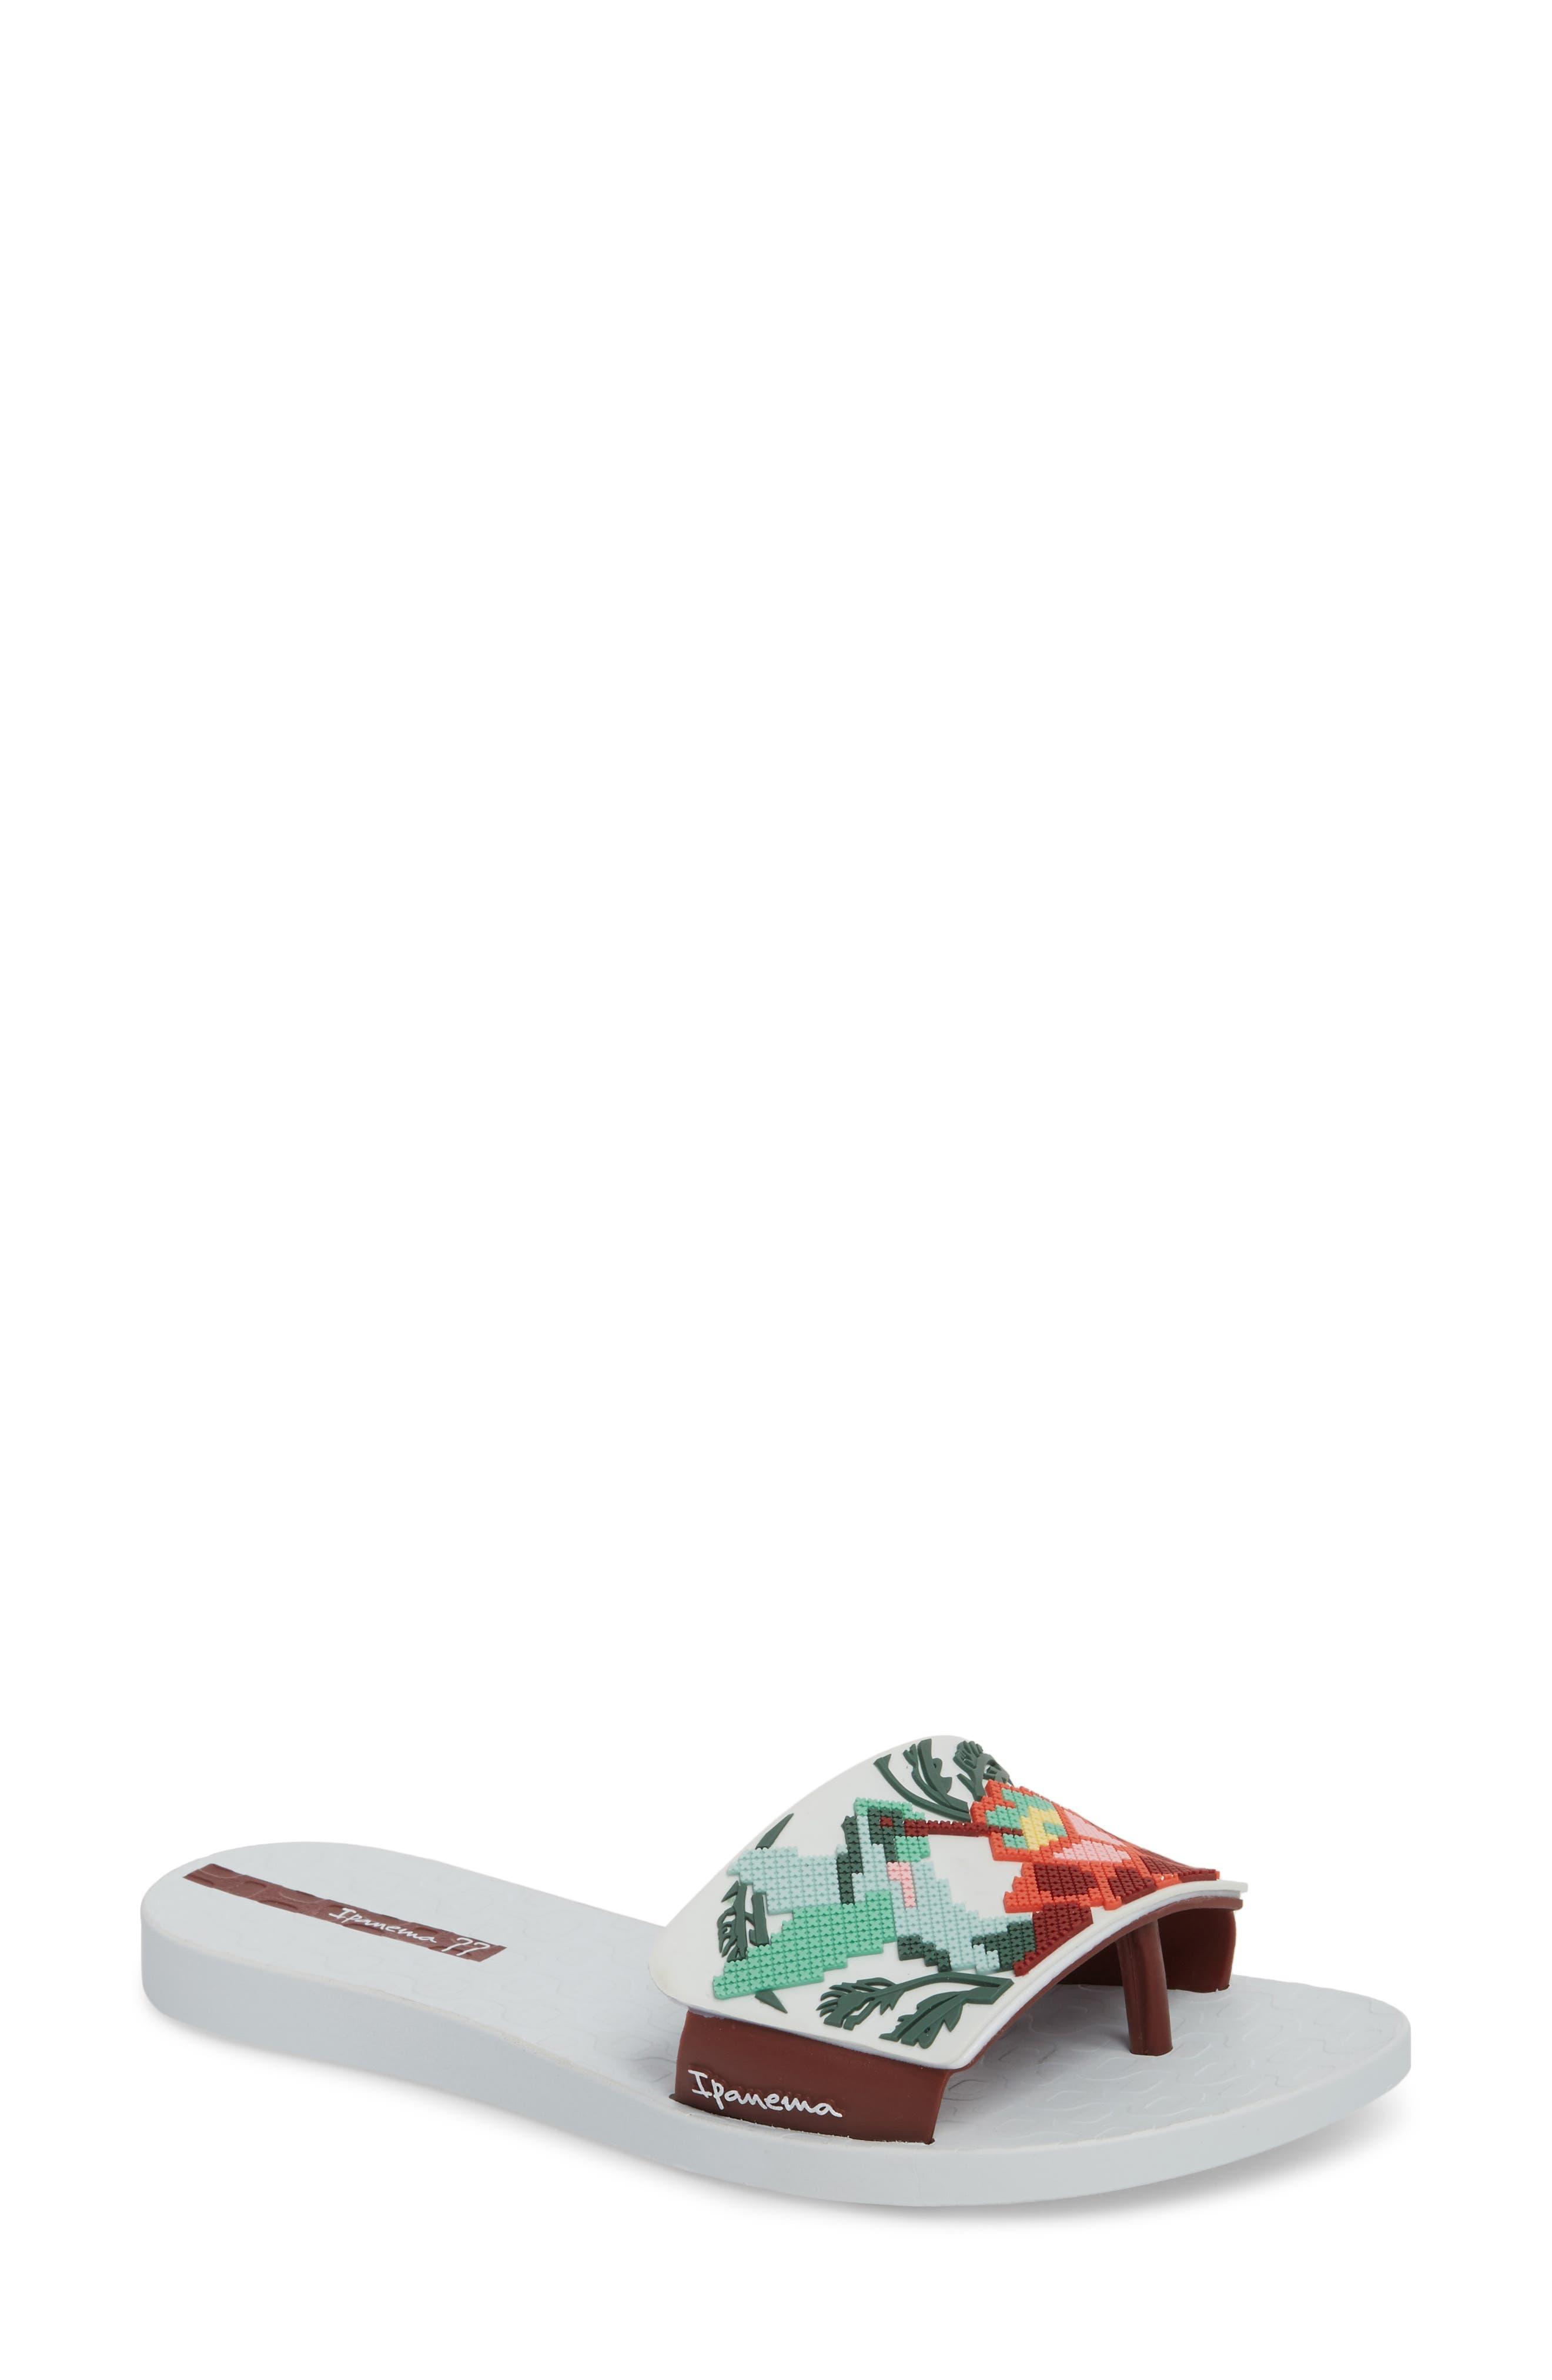 IPANEMA Nectar Floral Slide Sandal in White/ Burgundy